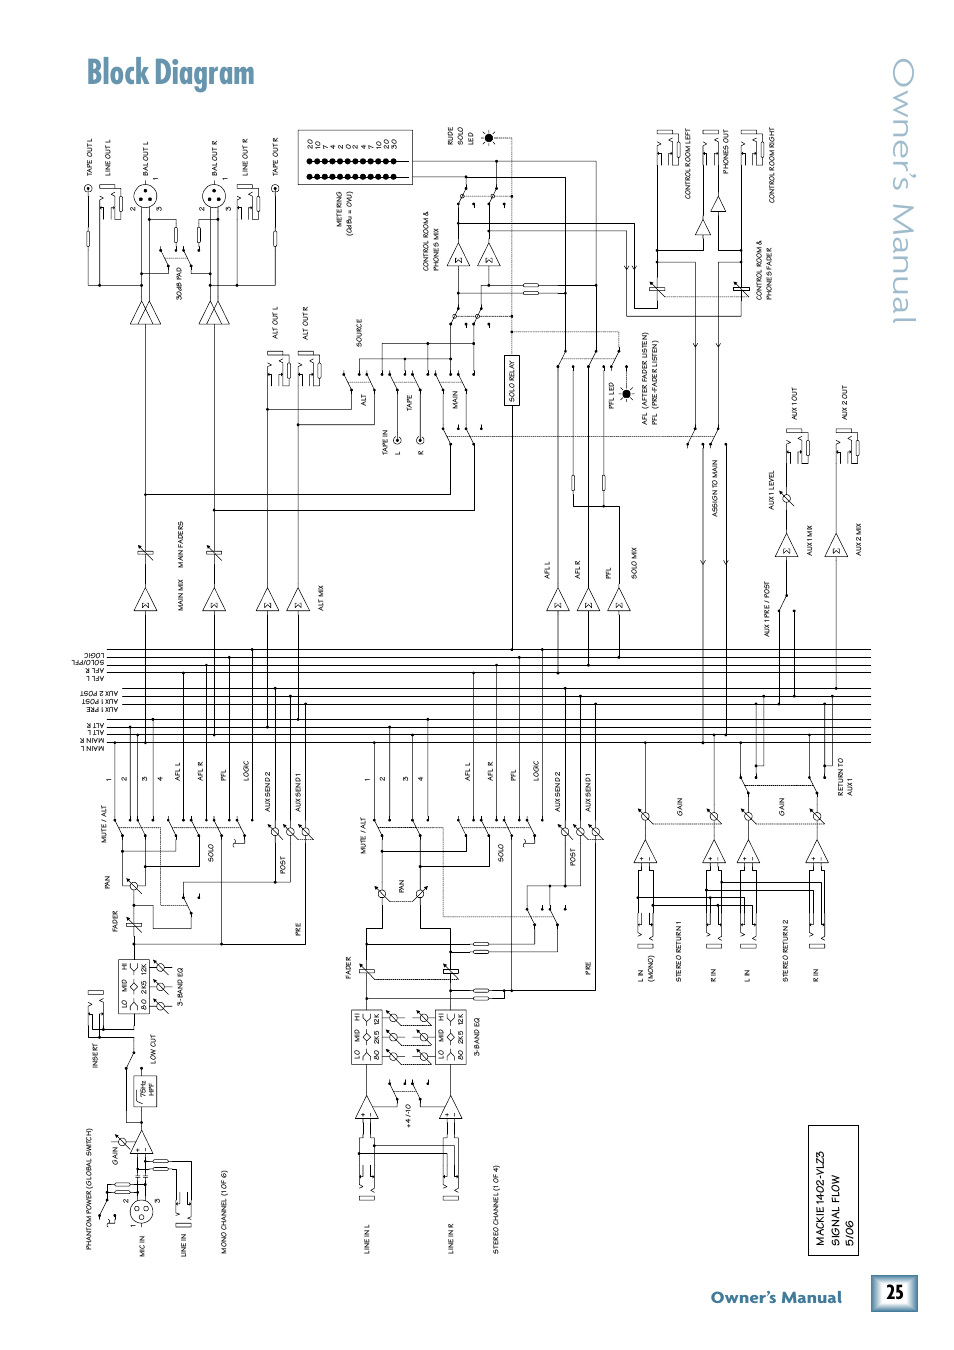 MACKIE 1402-VLZ3 MANUAL PDF